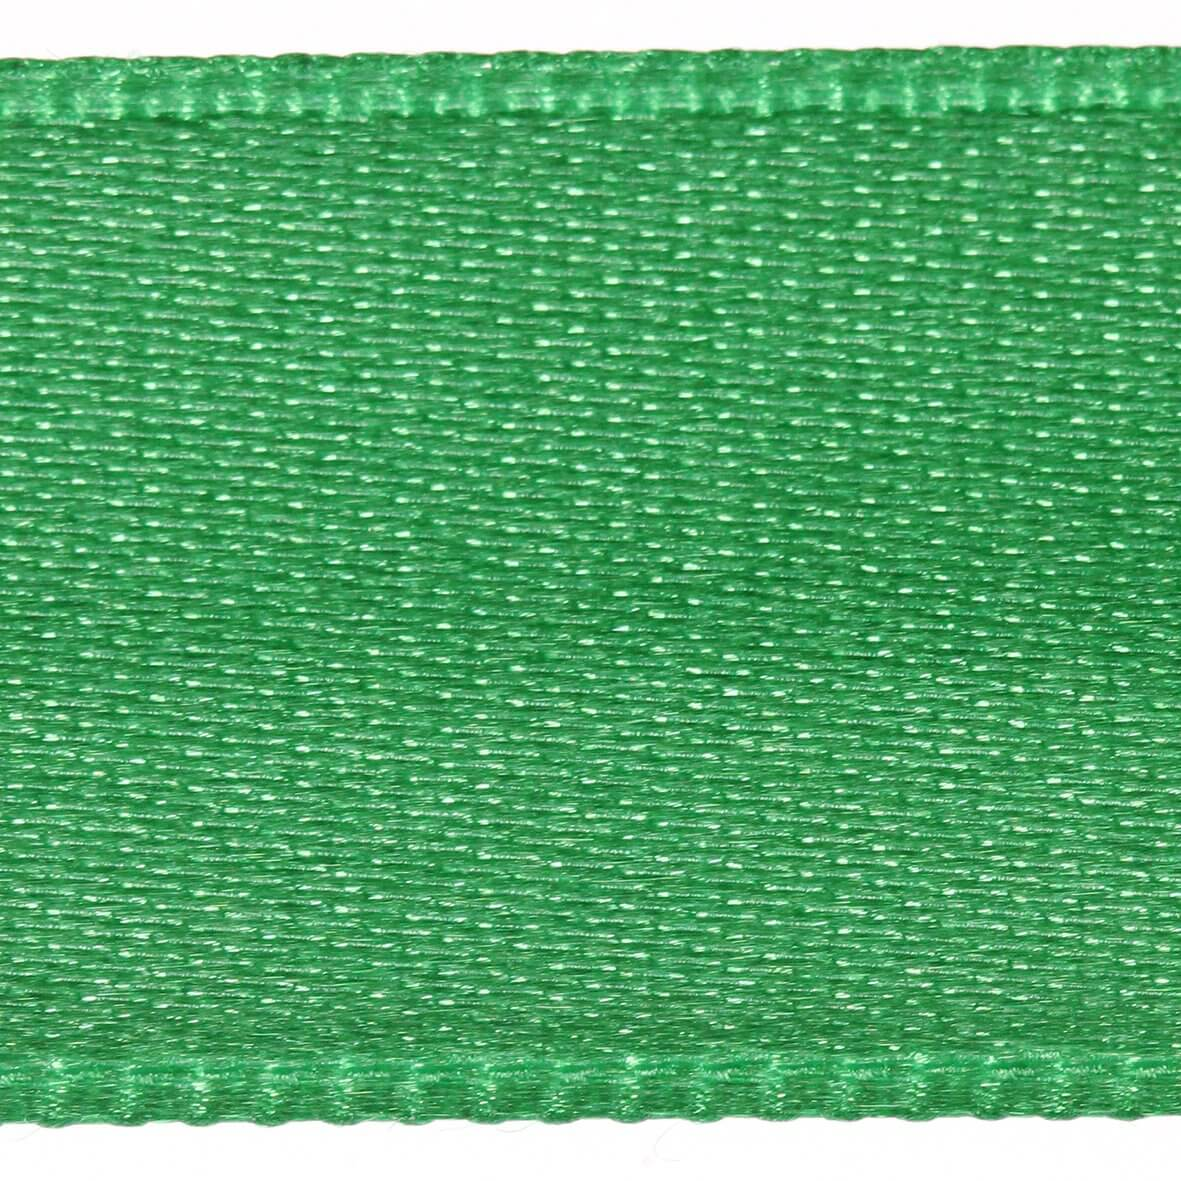 Emerald Col. 229 - 25mm Satab Satin Ribbon